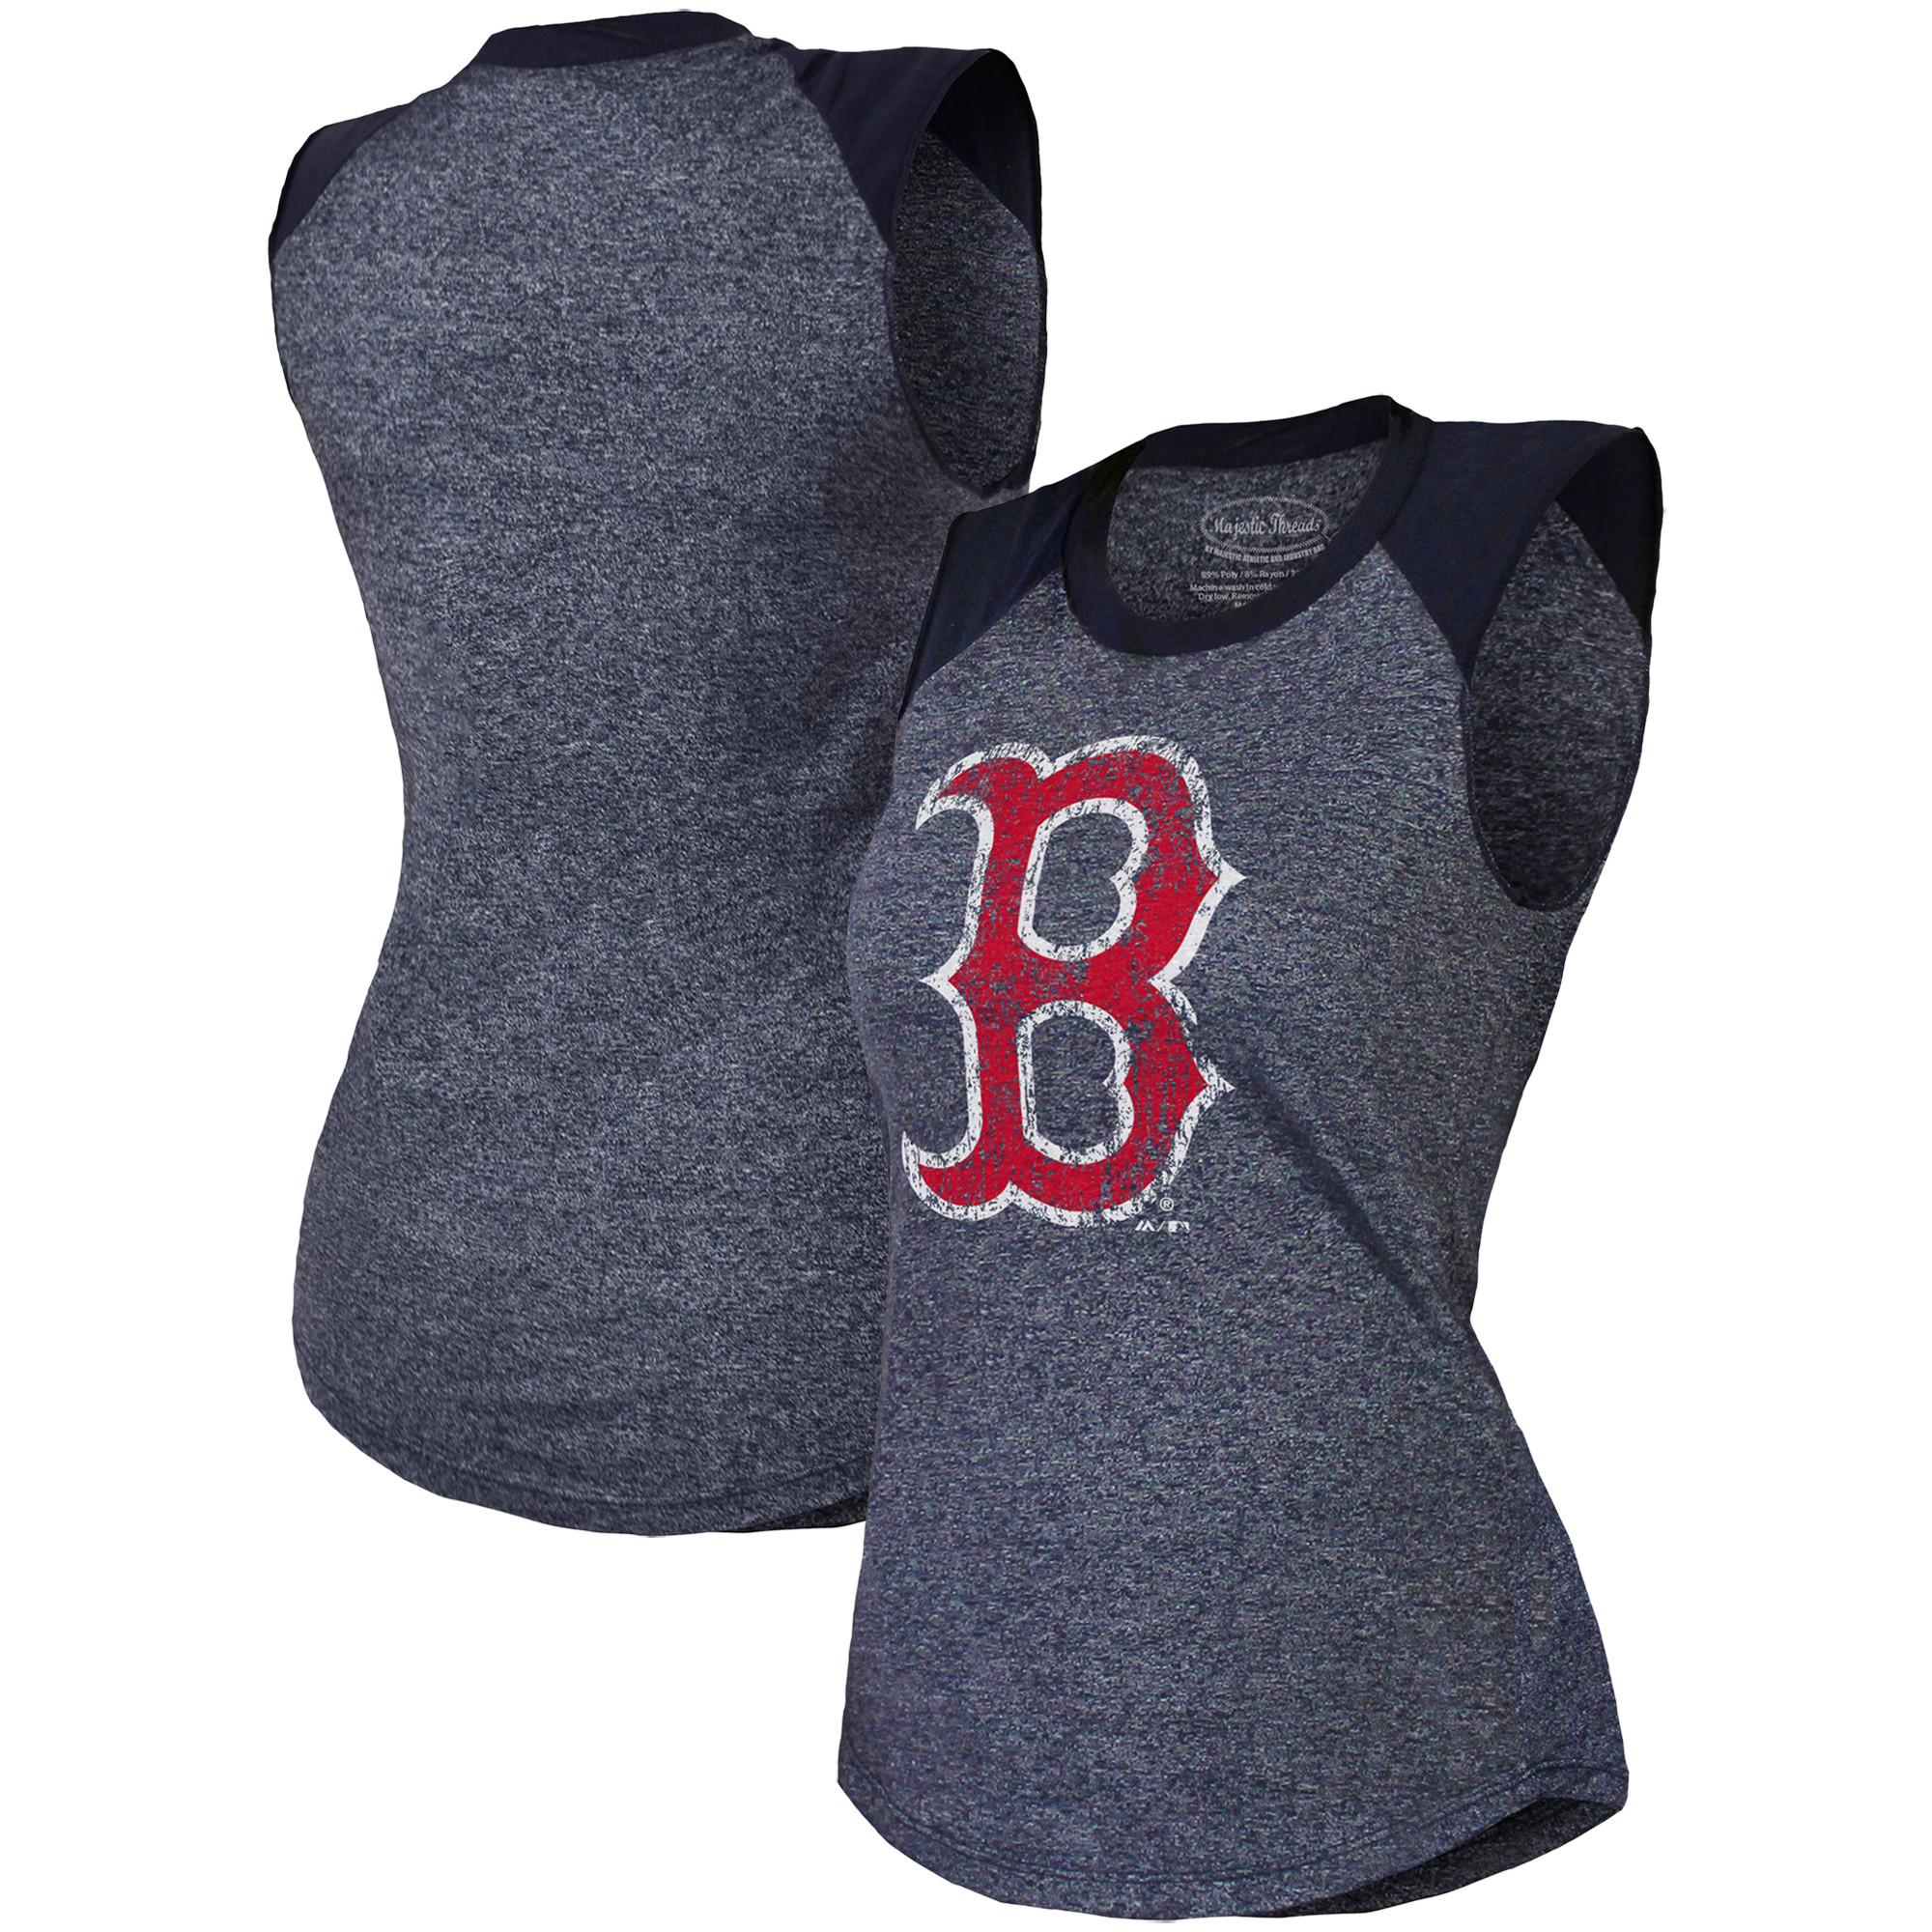 Boston Red Sox Majestic Threads Women's Raglan Tri-Blend Muscle Tank Top - Navy